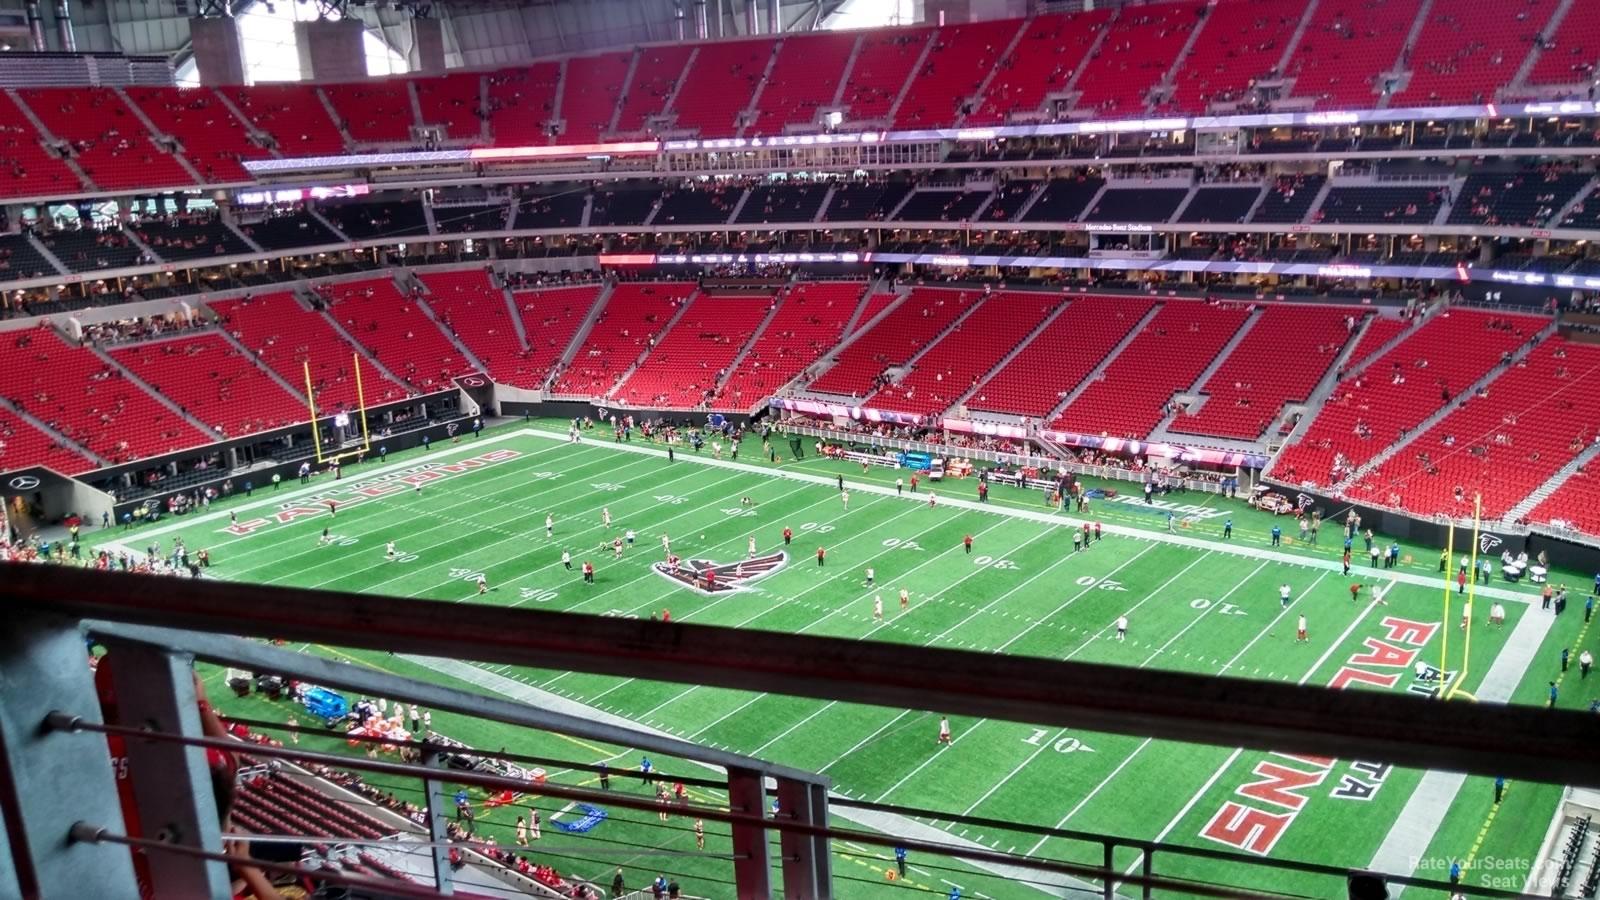 Mercedes-Benz Stadium Section 306 - Atlanta Falcons intended for Mercedes Benz Stadium Super Bowl Seating Chart